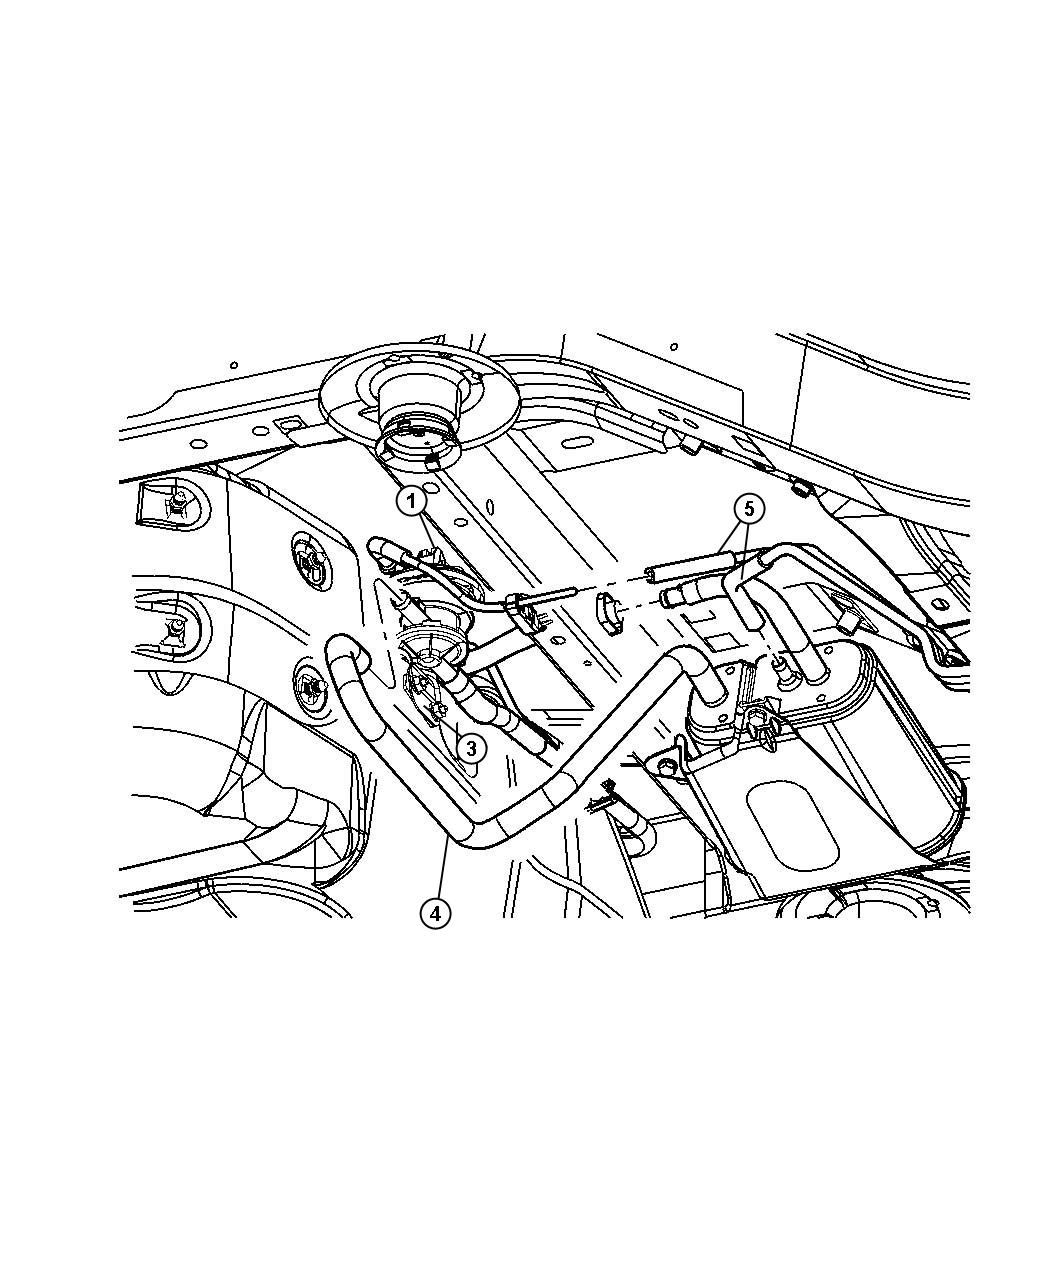 Jeep Liberty Leak Detection Pump 3 7l All V6 Engines